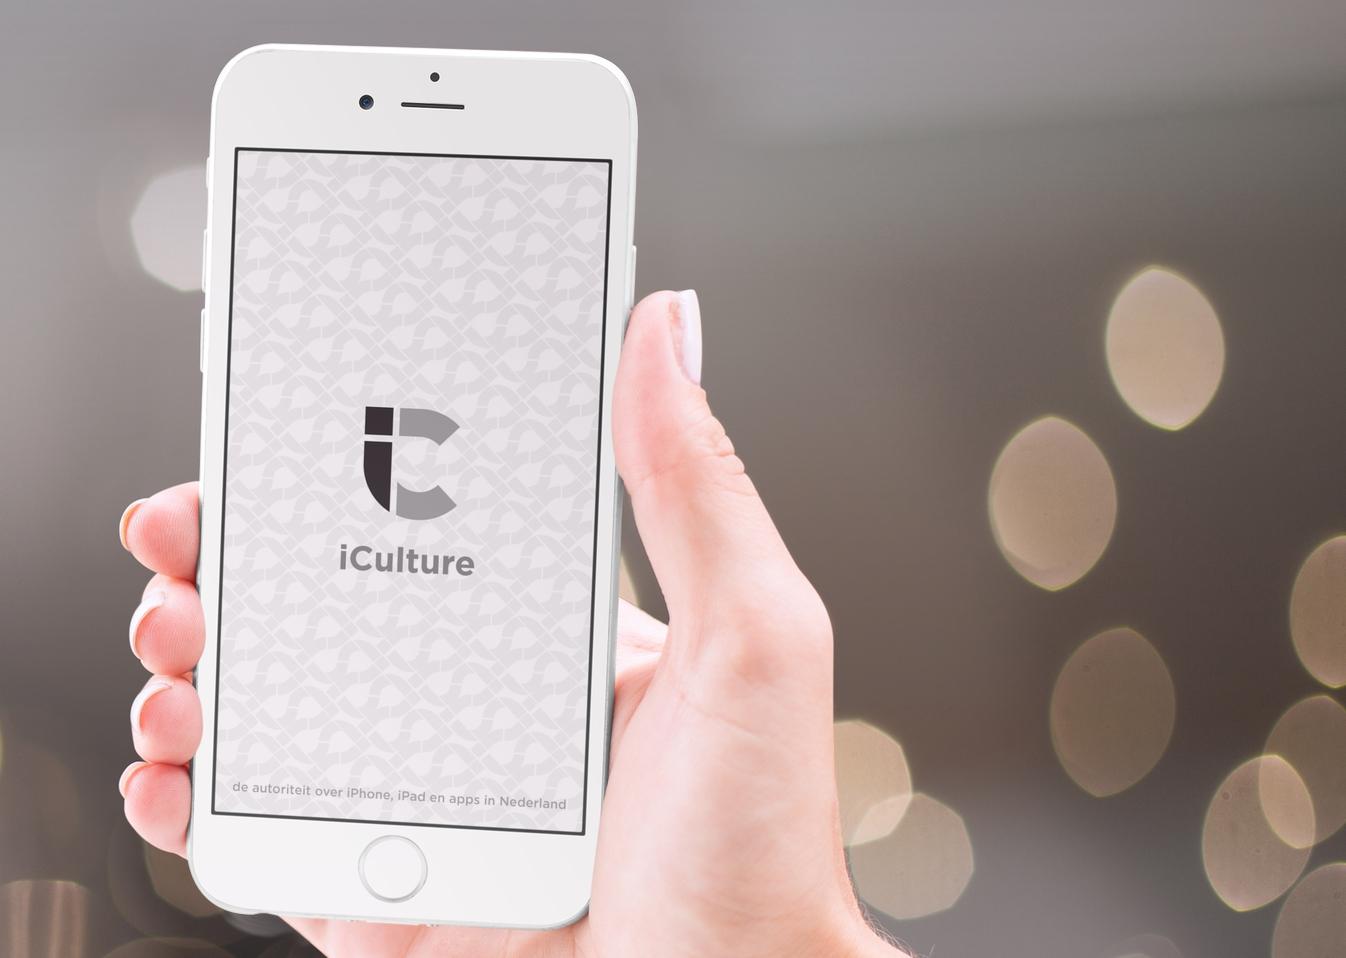 iCulture-app: bootscreen